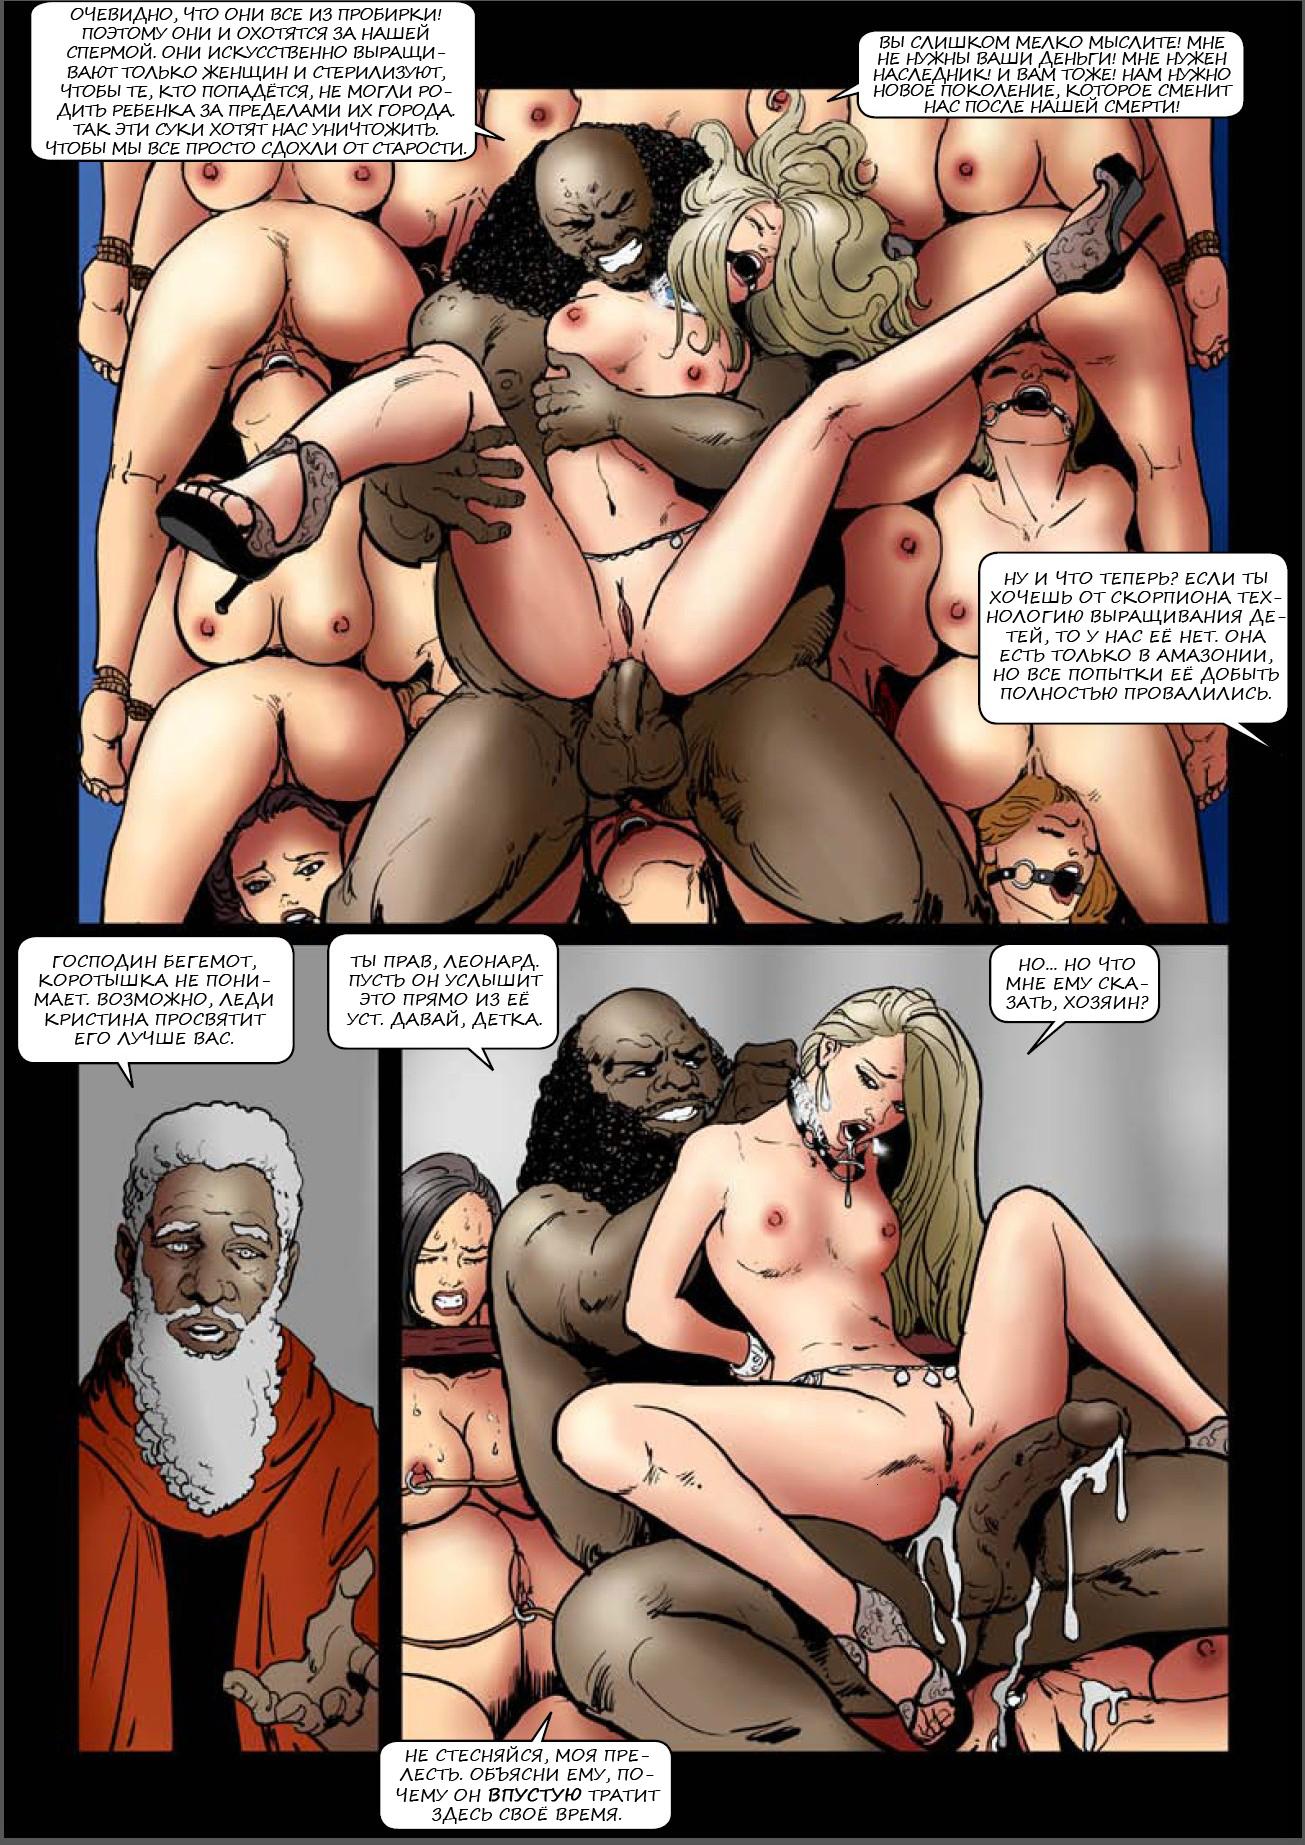 War and sex free porno pornos picture